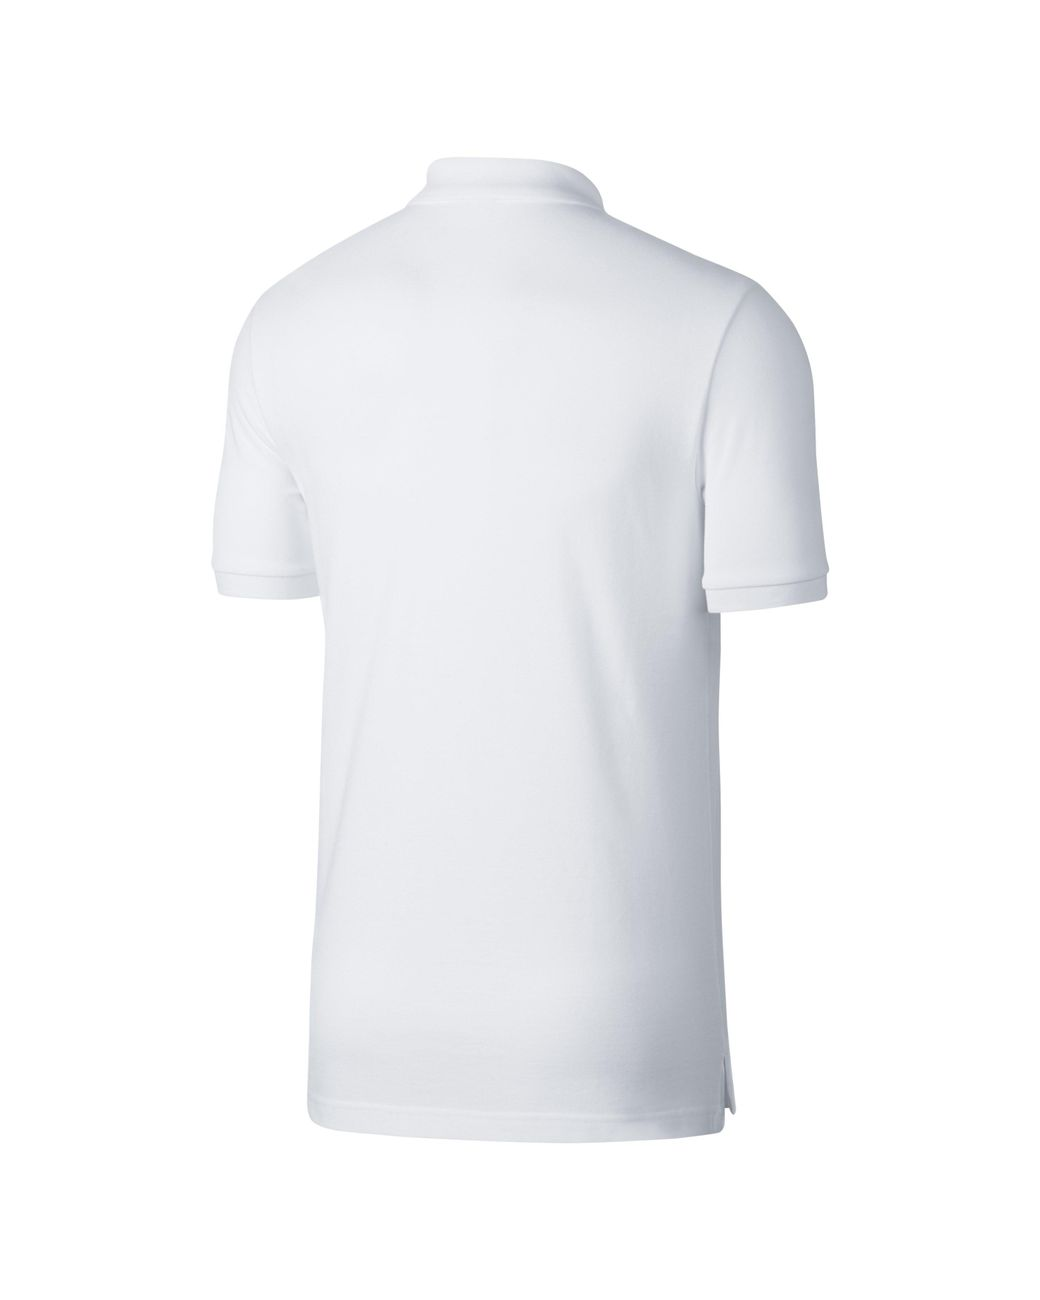 e1bb43676fad3c Nike Tottenham Hotspur Polo in White for Men - Lyst